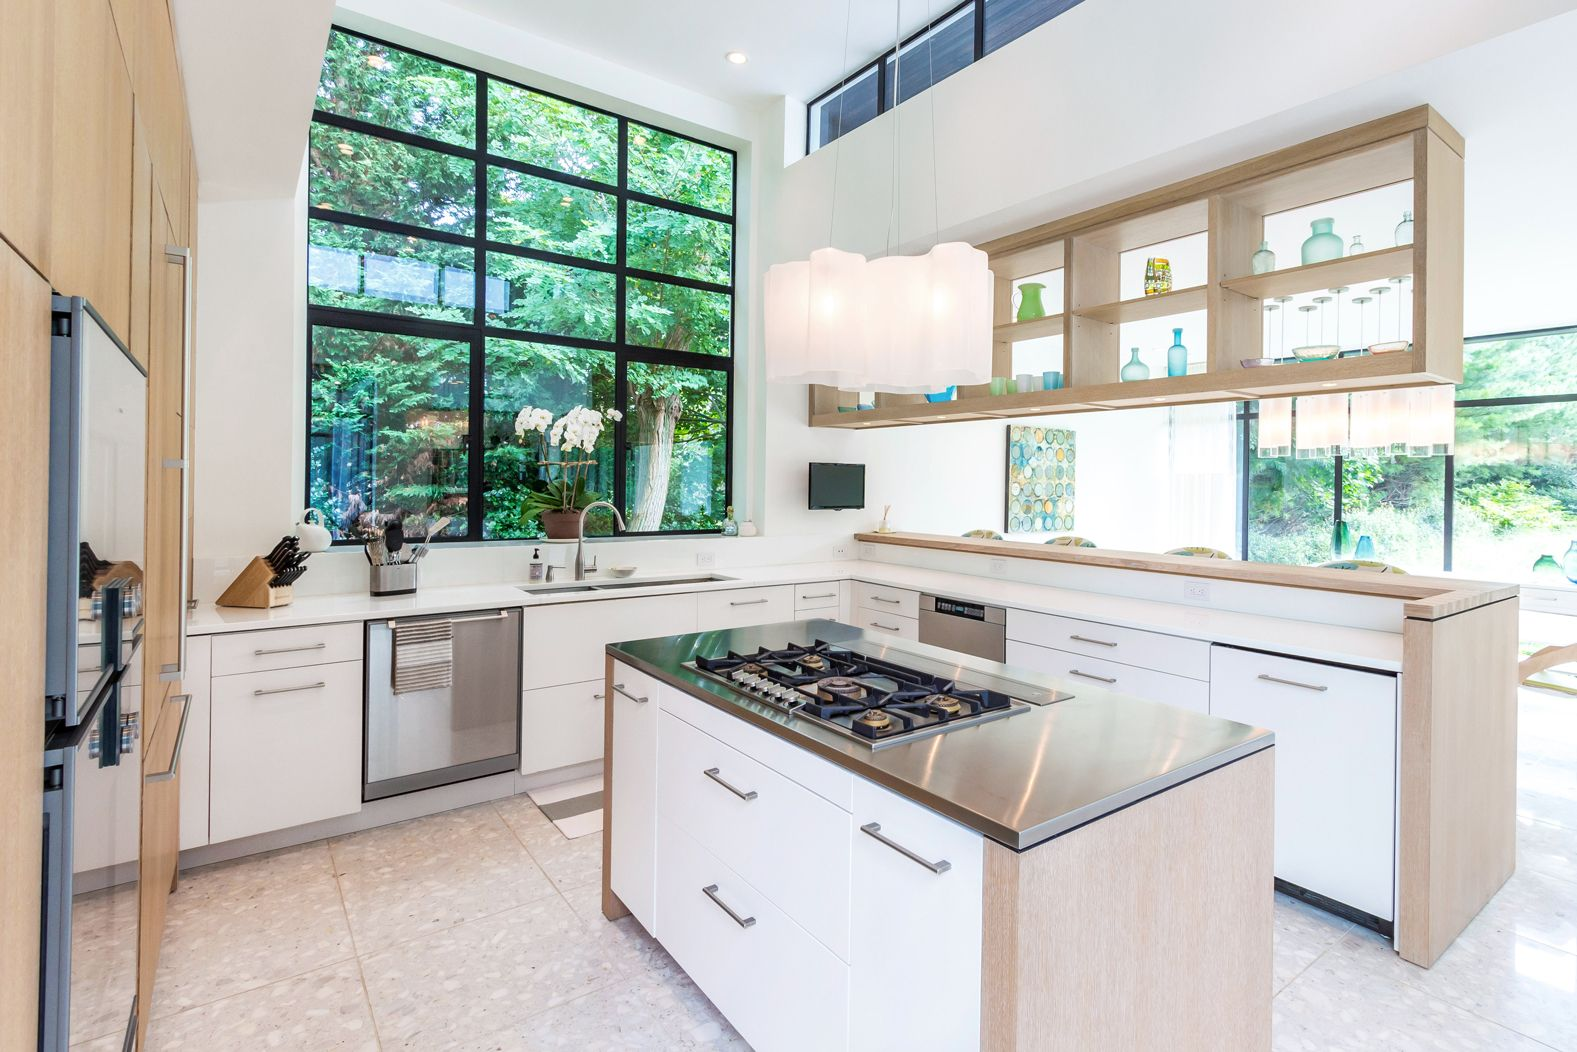 This modern Bakes & Kropp kitchen showcases European minimalism ...